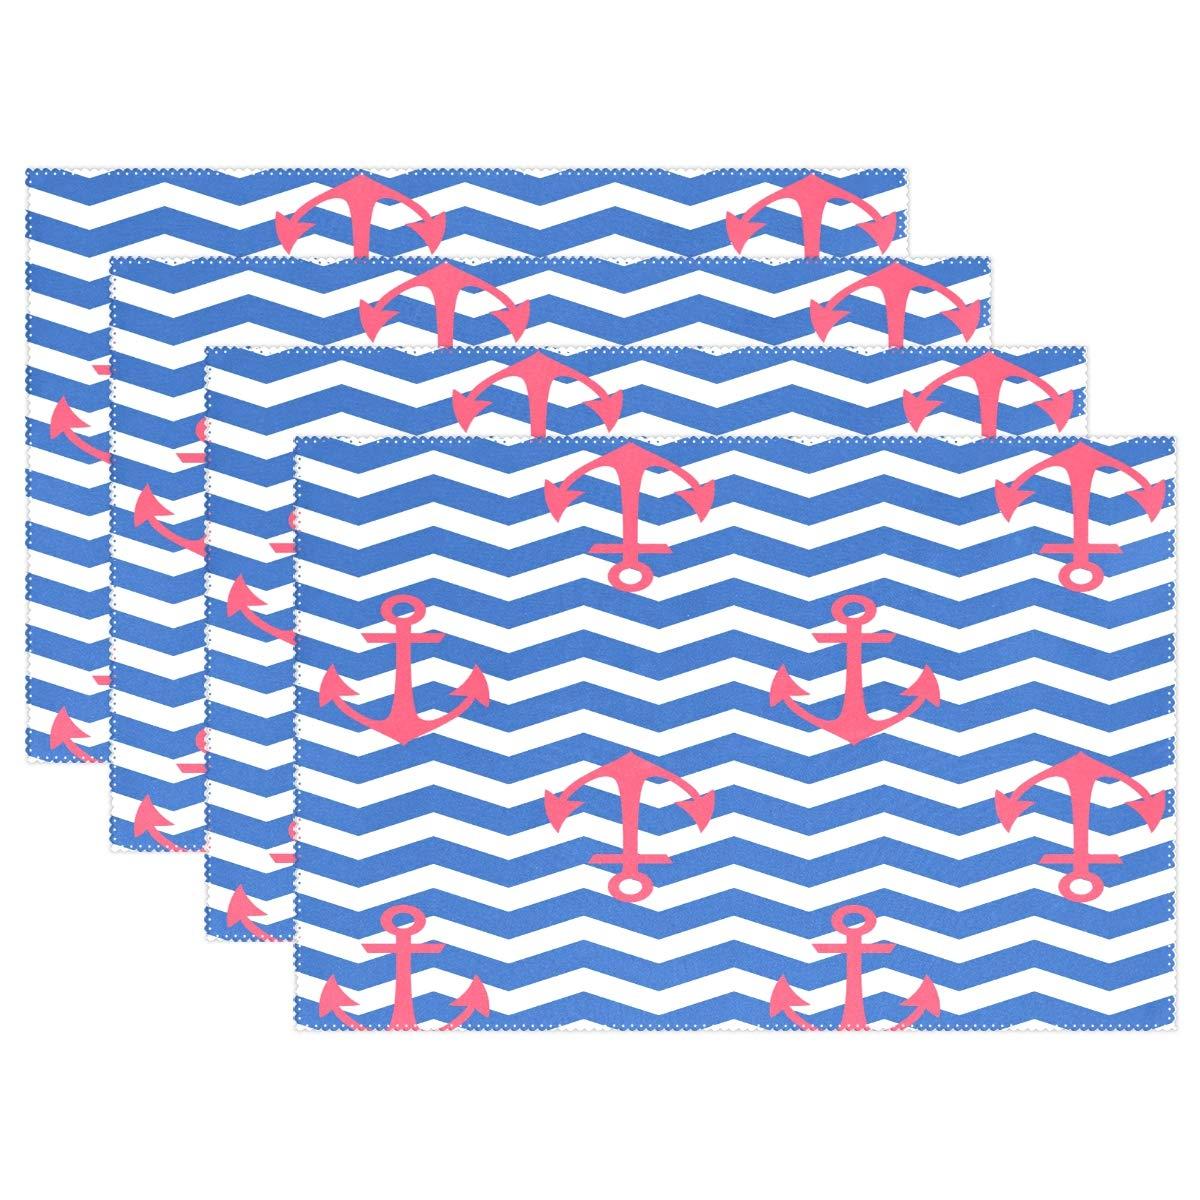 Yochoice ALAZA 幾何学模様 航海用錨 プレースマット プレートホルダー 1セット ポリエステル テーブル マット プロテクター キッチン ダイニングルーム 12インチ x 18インチ 12x18x6 in 6  B07KRV2V3K